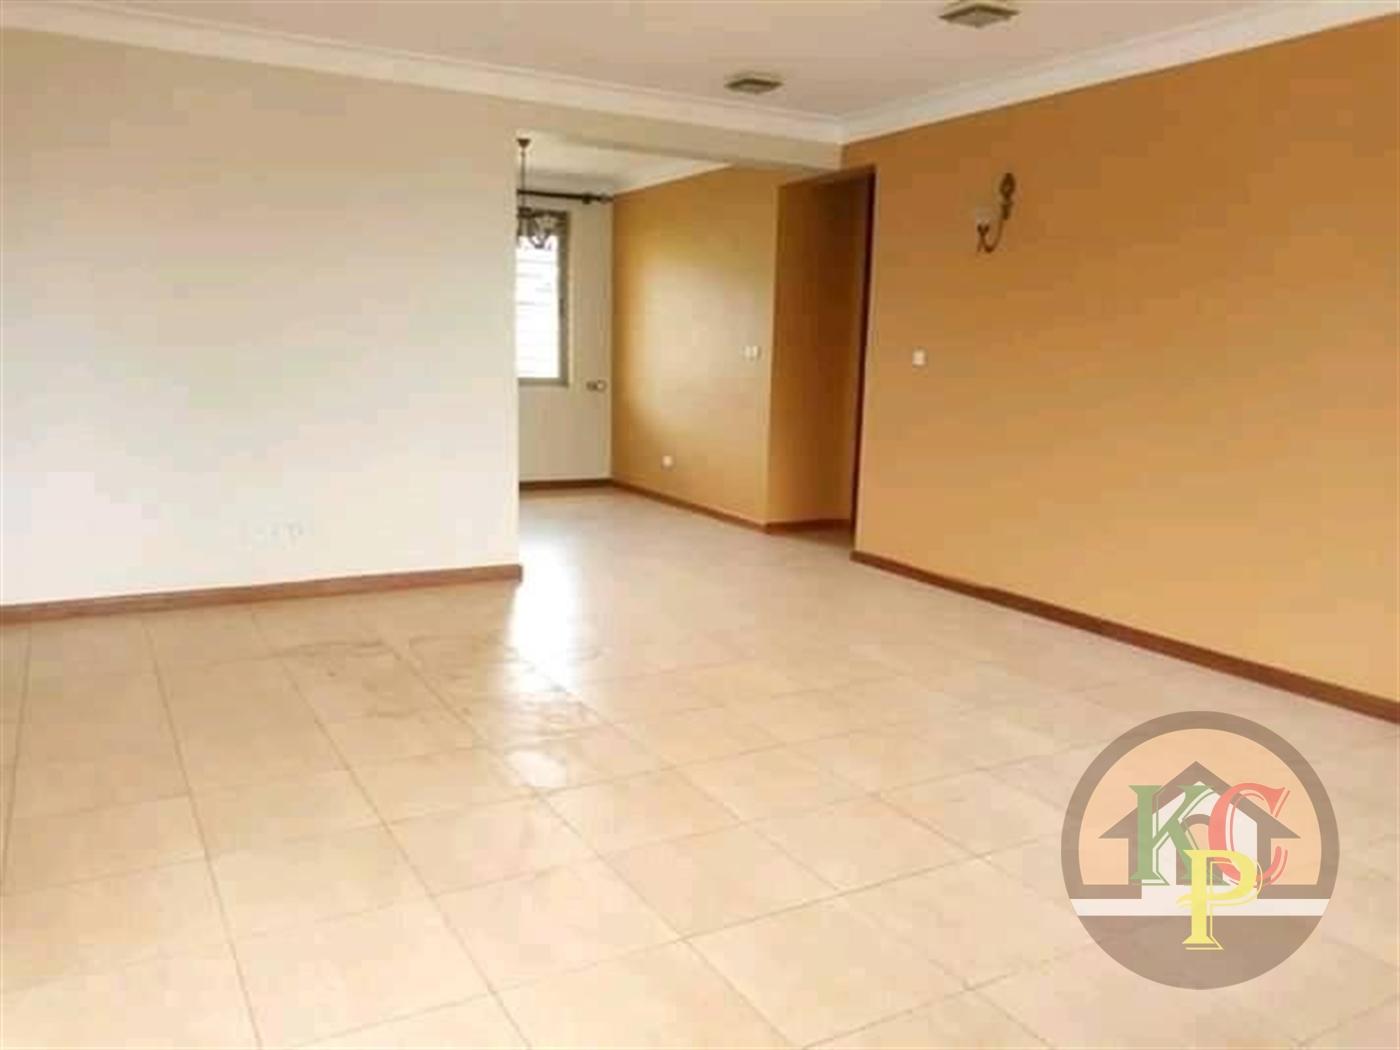 Apartment for rent in Mutungo Kaliro